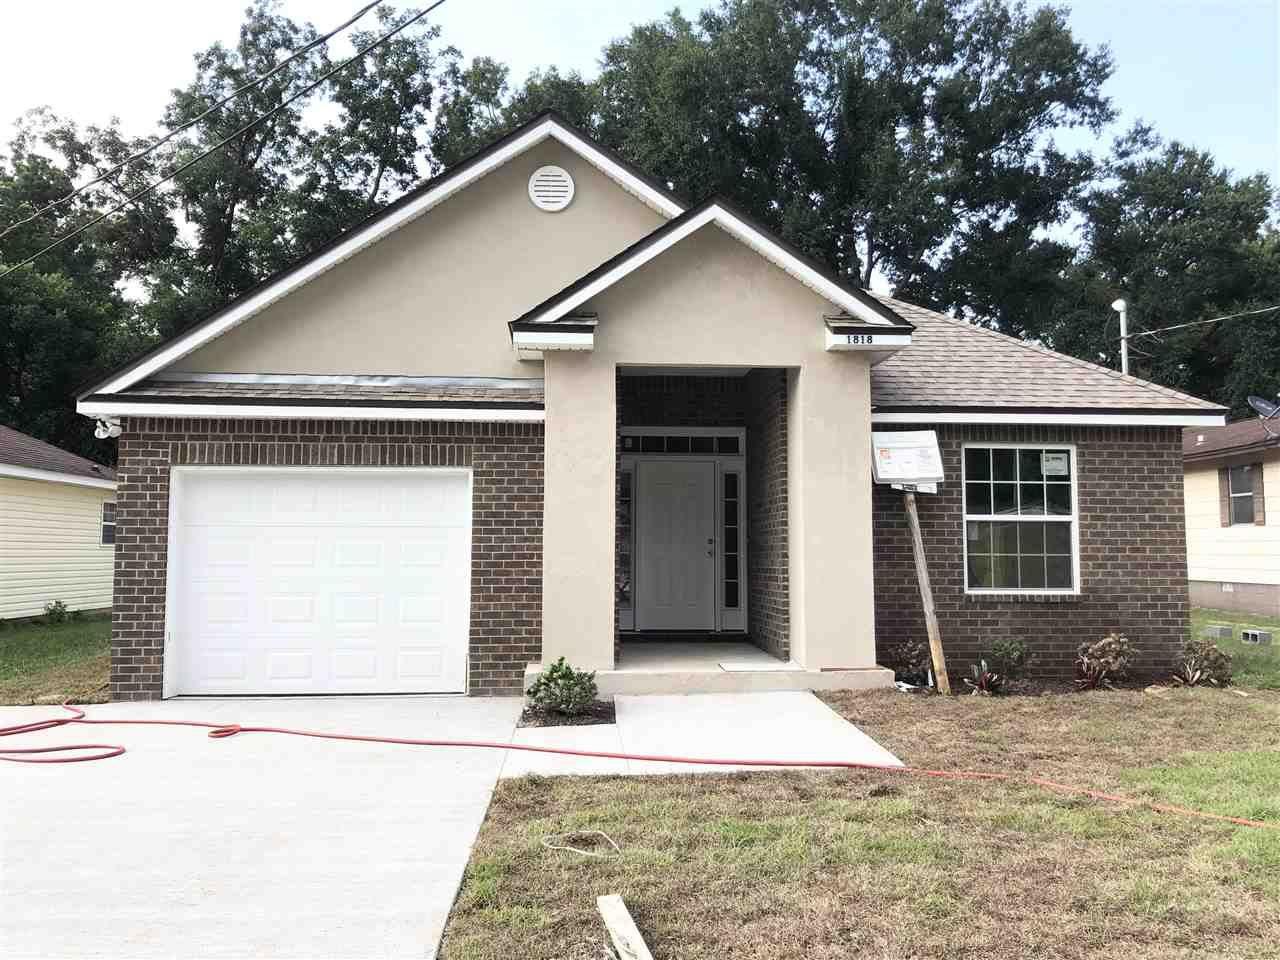 1818 W Inlet Street, Quincy, FL 32351 - MLS#: 318995